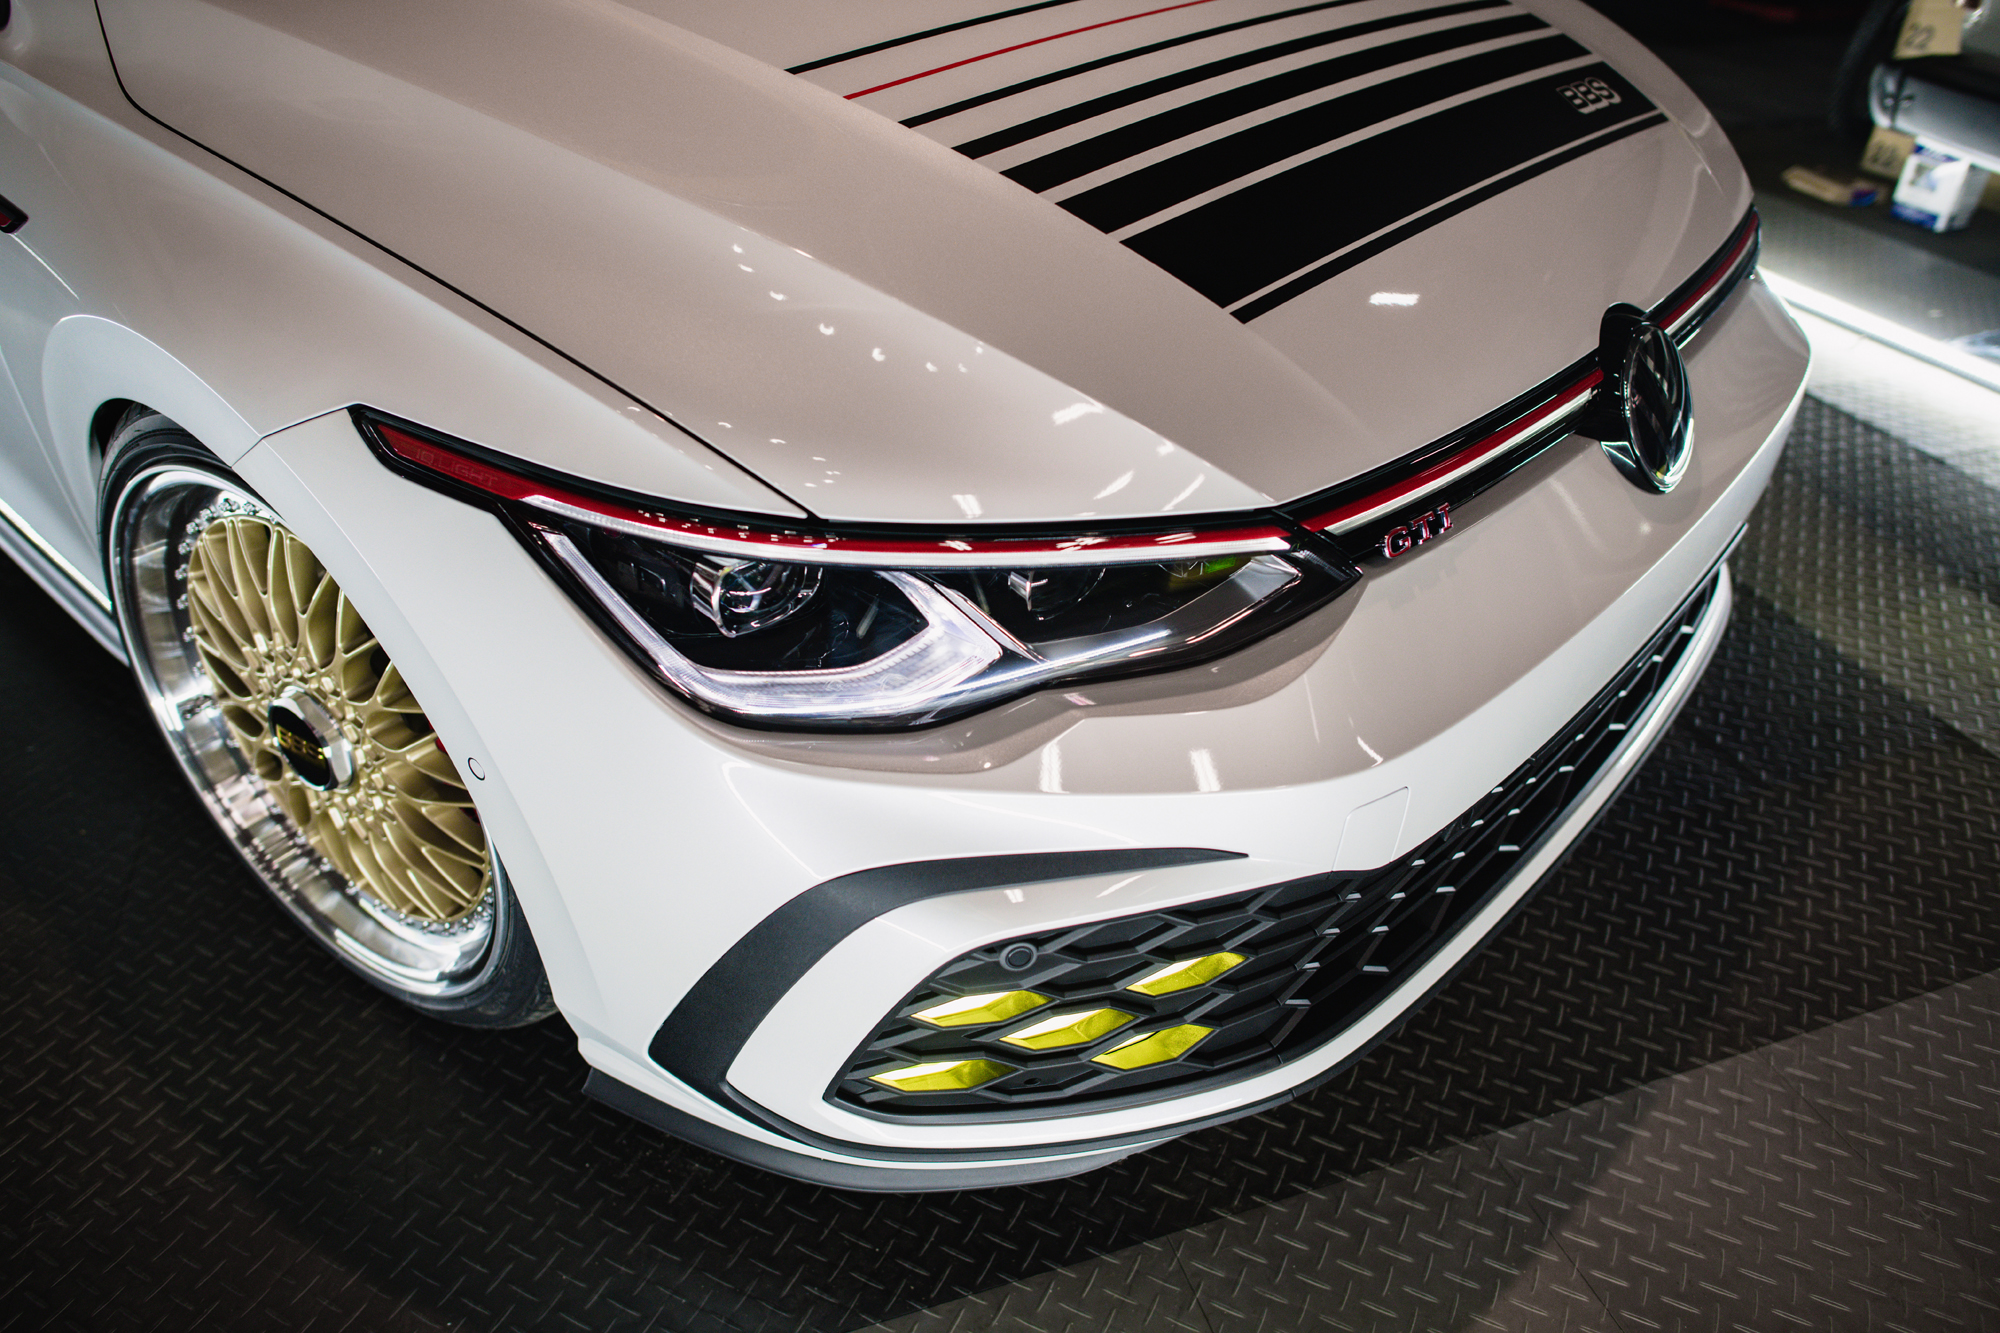 VW Golf GTi BBS concept interior front